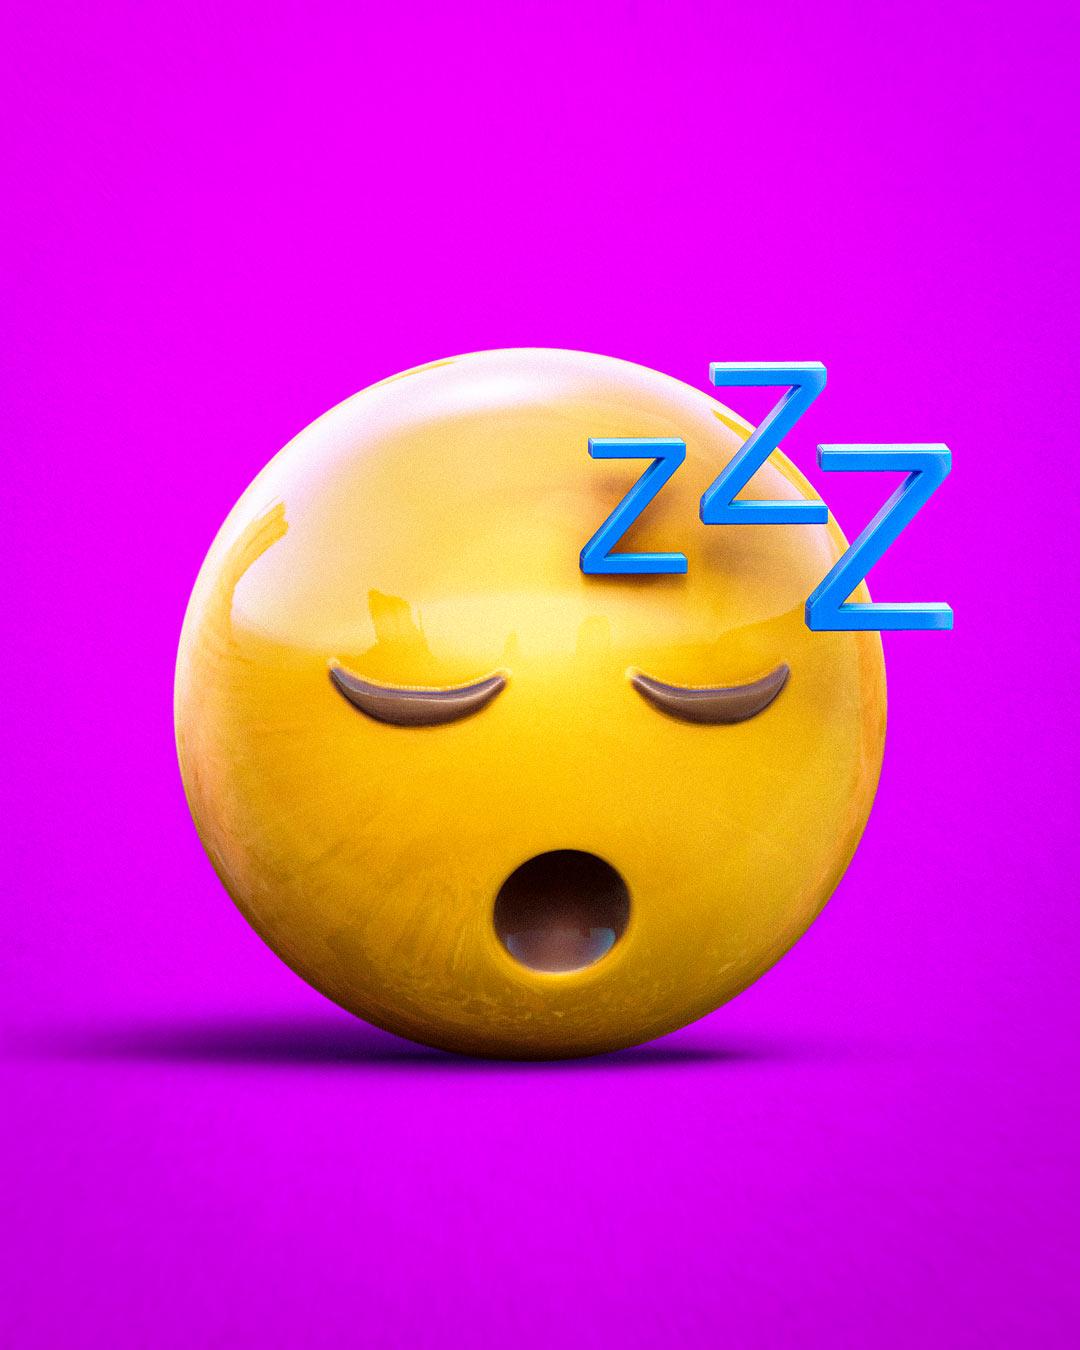 3D tired emoji